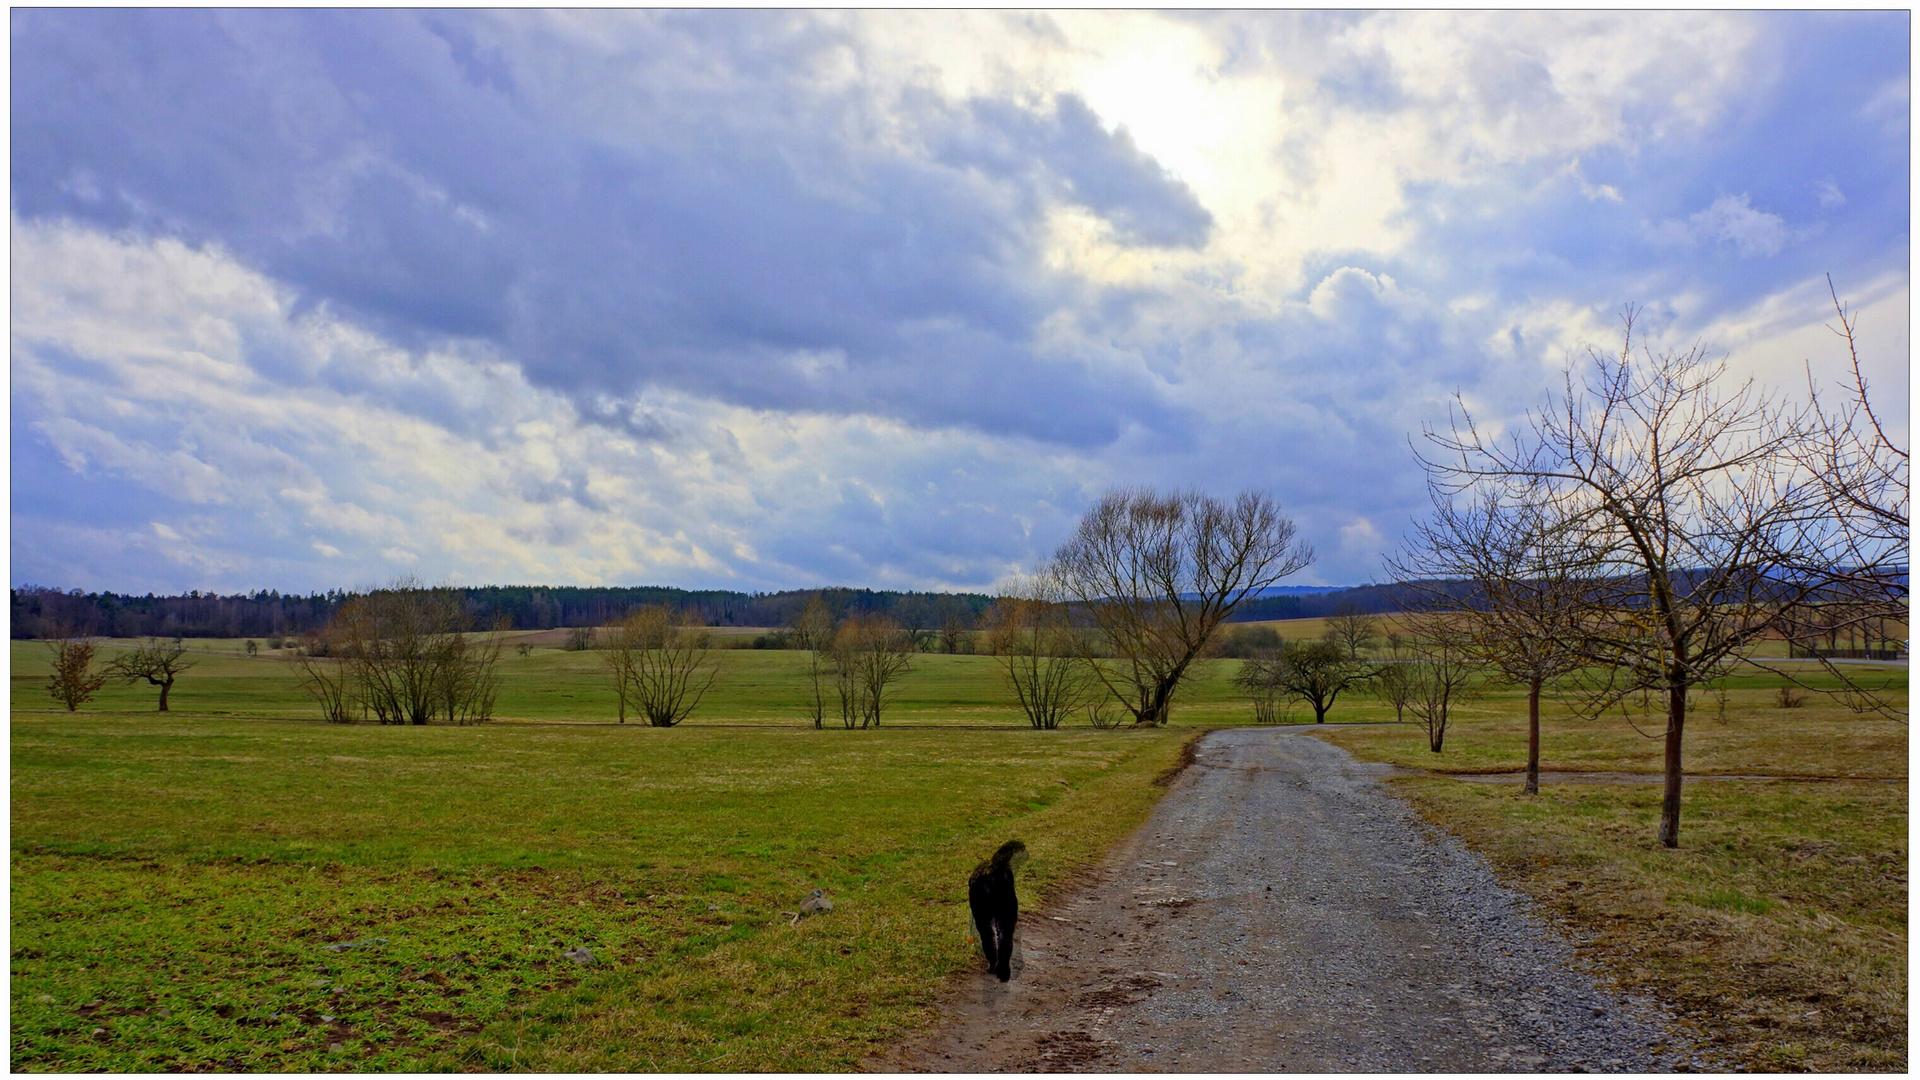 Spaziergang mit Wicky-Emily (paseando con Wicky-Emily)